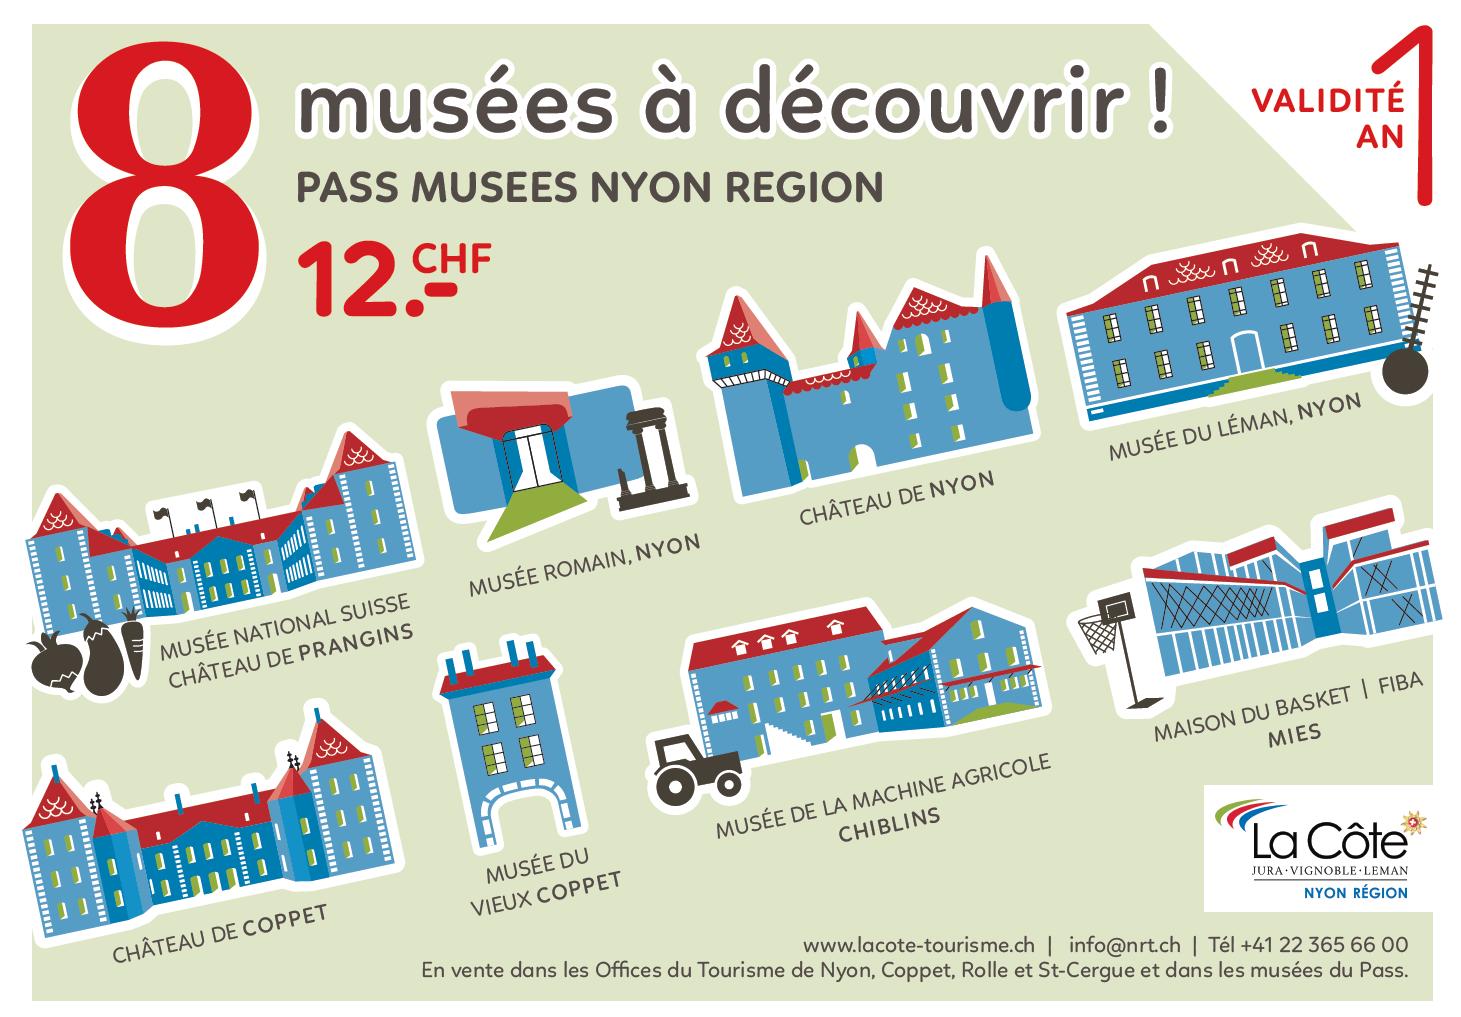 Museums Pass Nyon Region